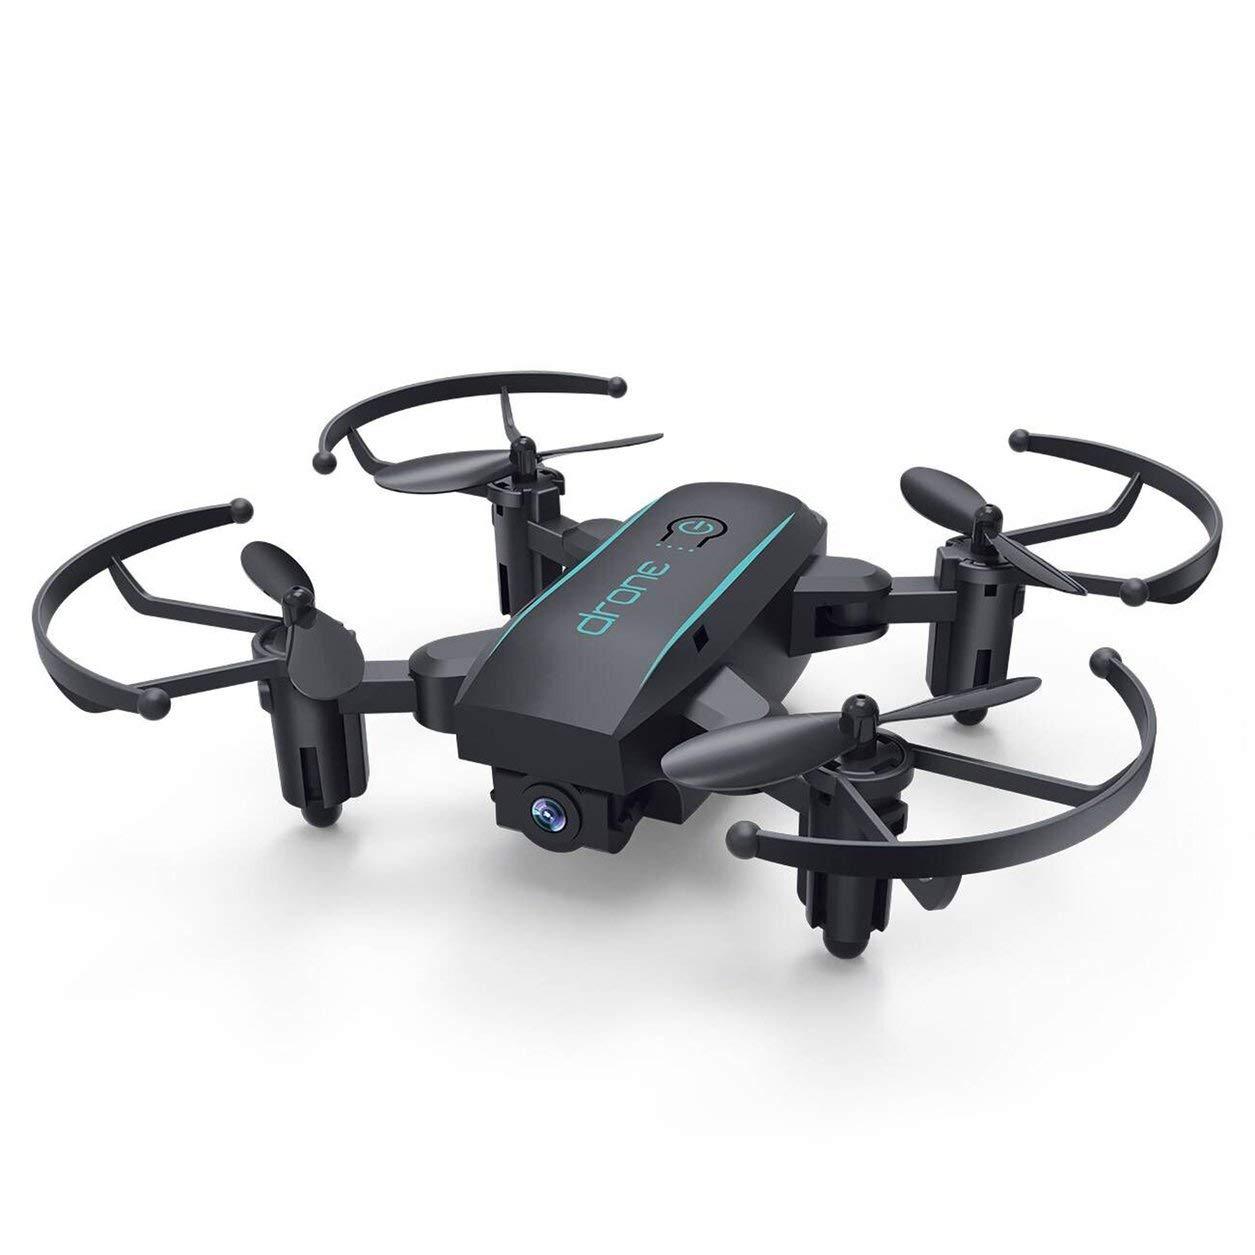 Dailyinshop Faltbare Mini-Drohne mit HD 720P Kamera FPV WiFi 2.4G RC Drone Altitude Hold